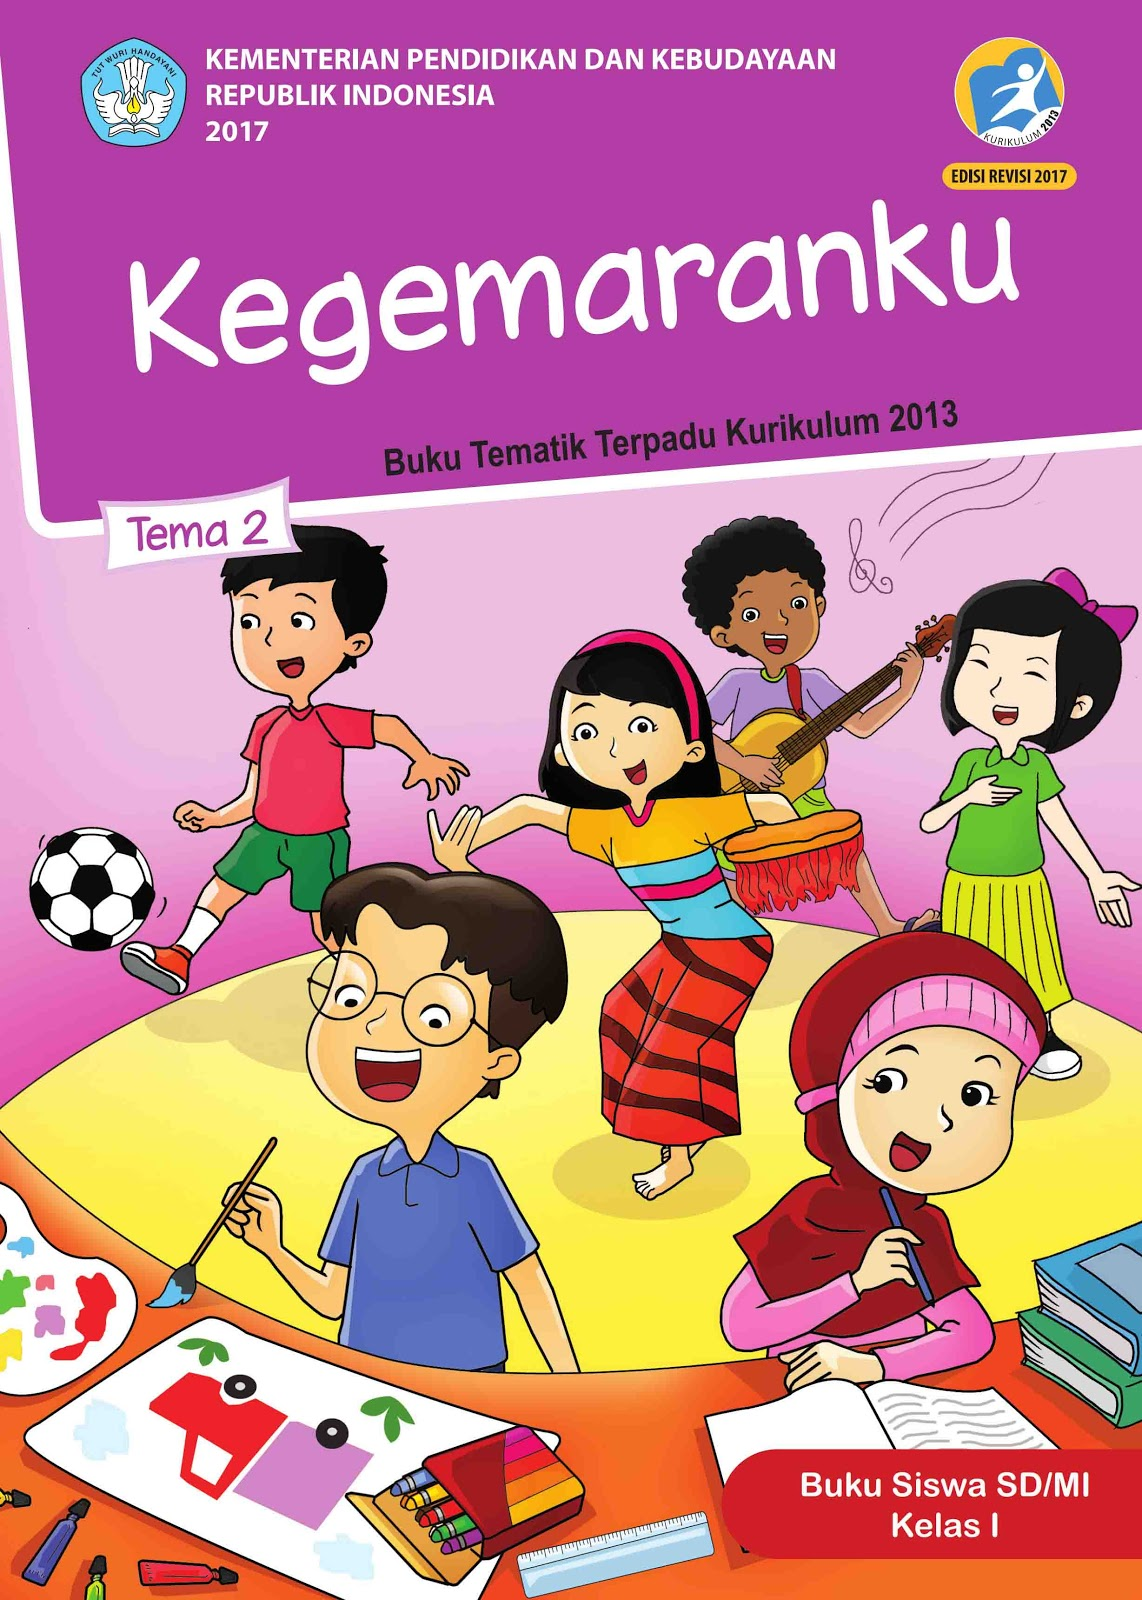 Buku Siswa Kelas 1 Sd Mi Tema 2 Kegemaranku Pdf Sanjayaops